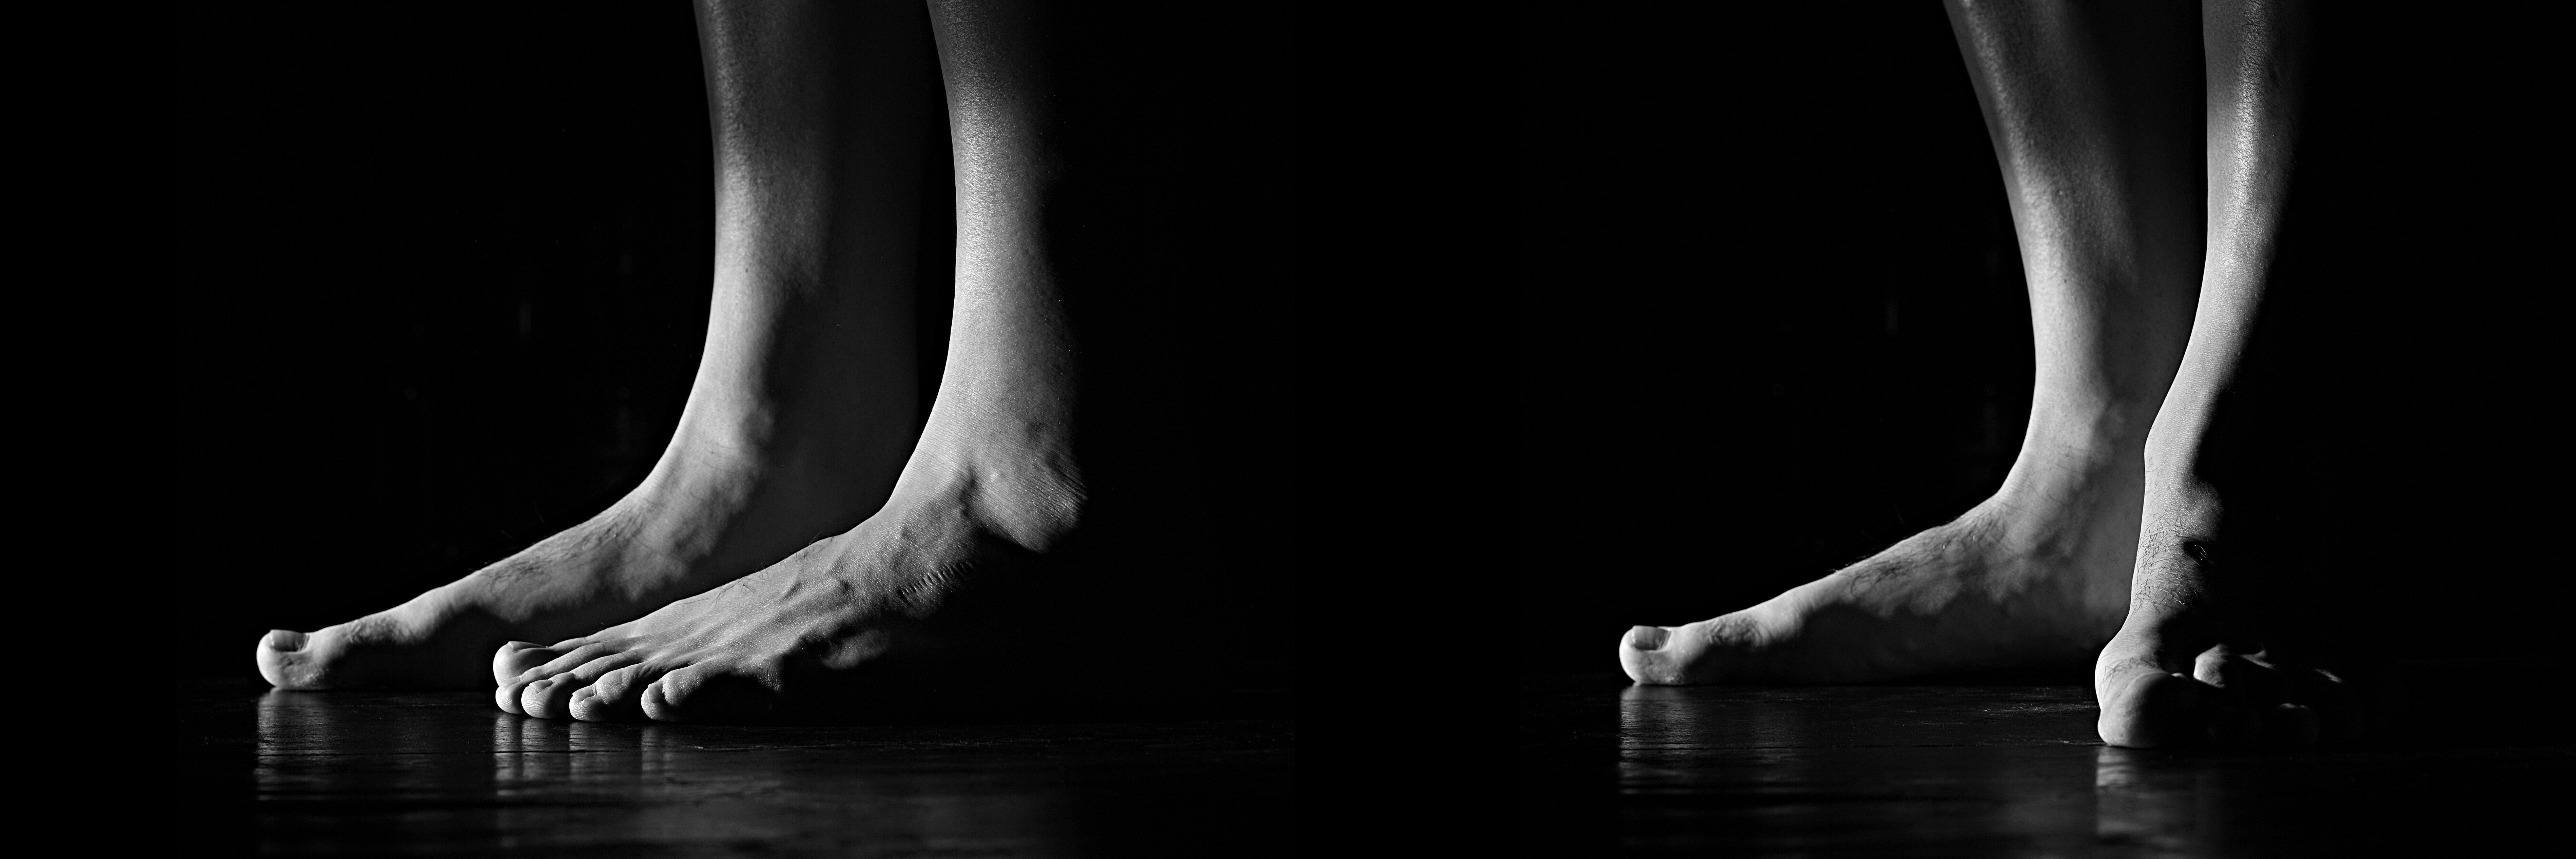 Feet cc Jonathan Cohen